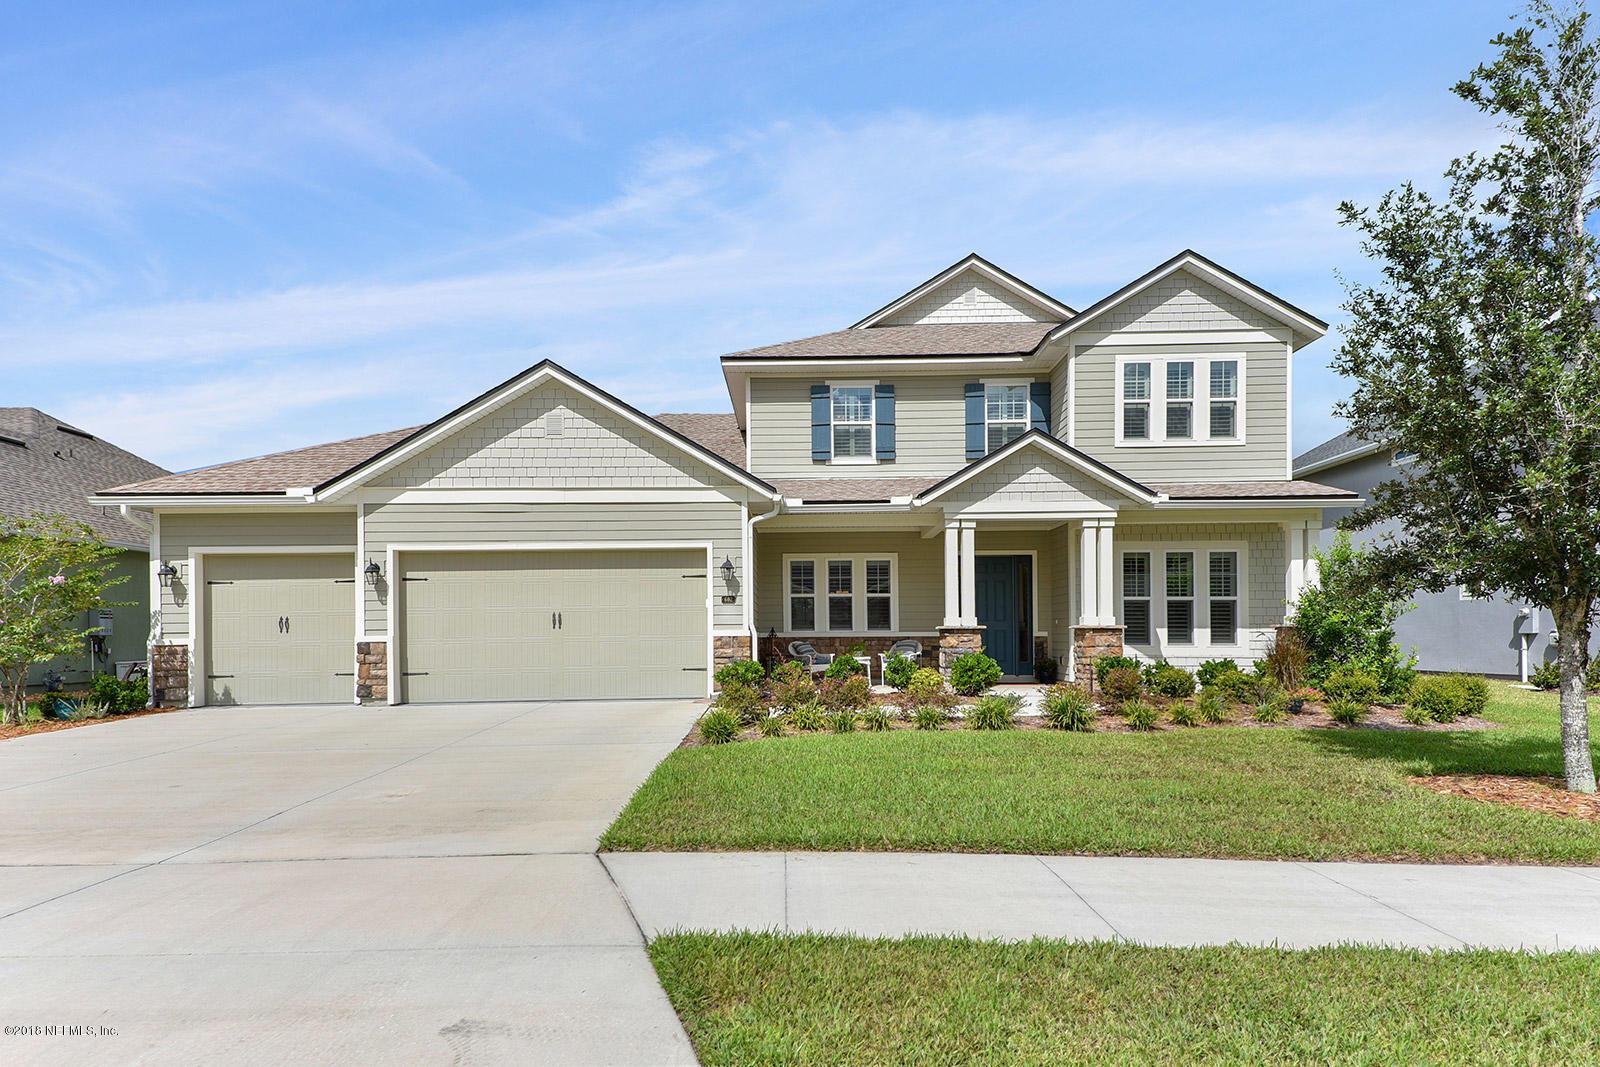 602 OXFORD ESTATES, ST JOHNS, FLORIDA 32259, 5 Bedrooms Bedrooms, ,4 BathroomsBathrooms,Residential - single family,For sale,OXFORD ESTATES,957403